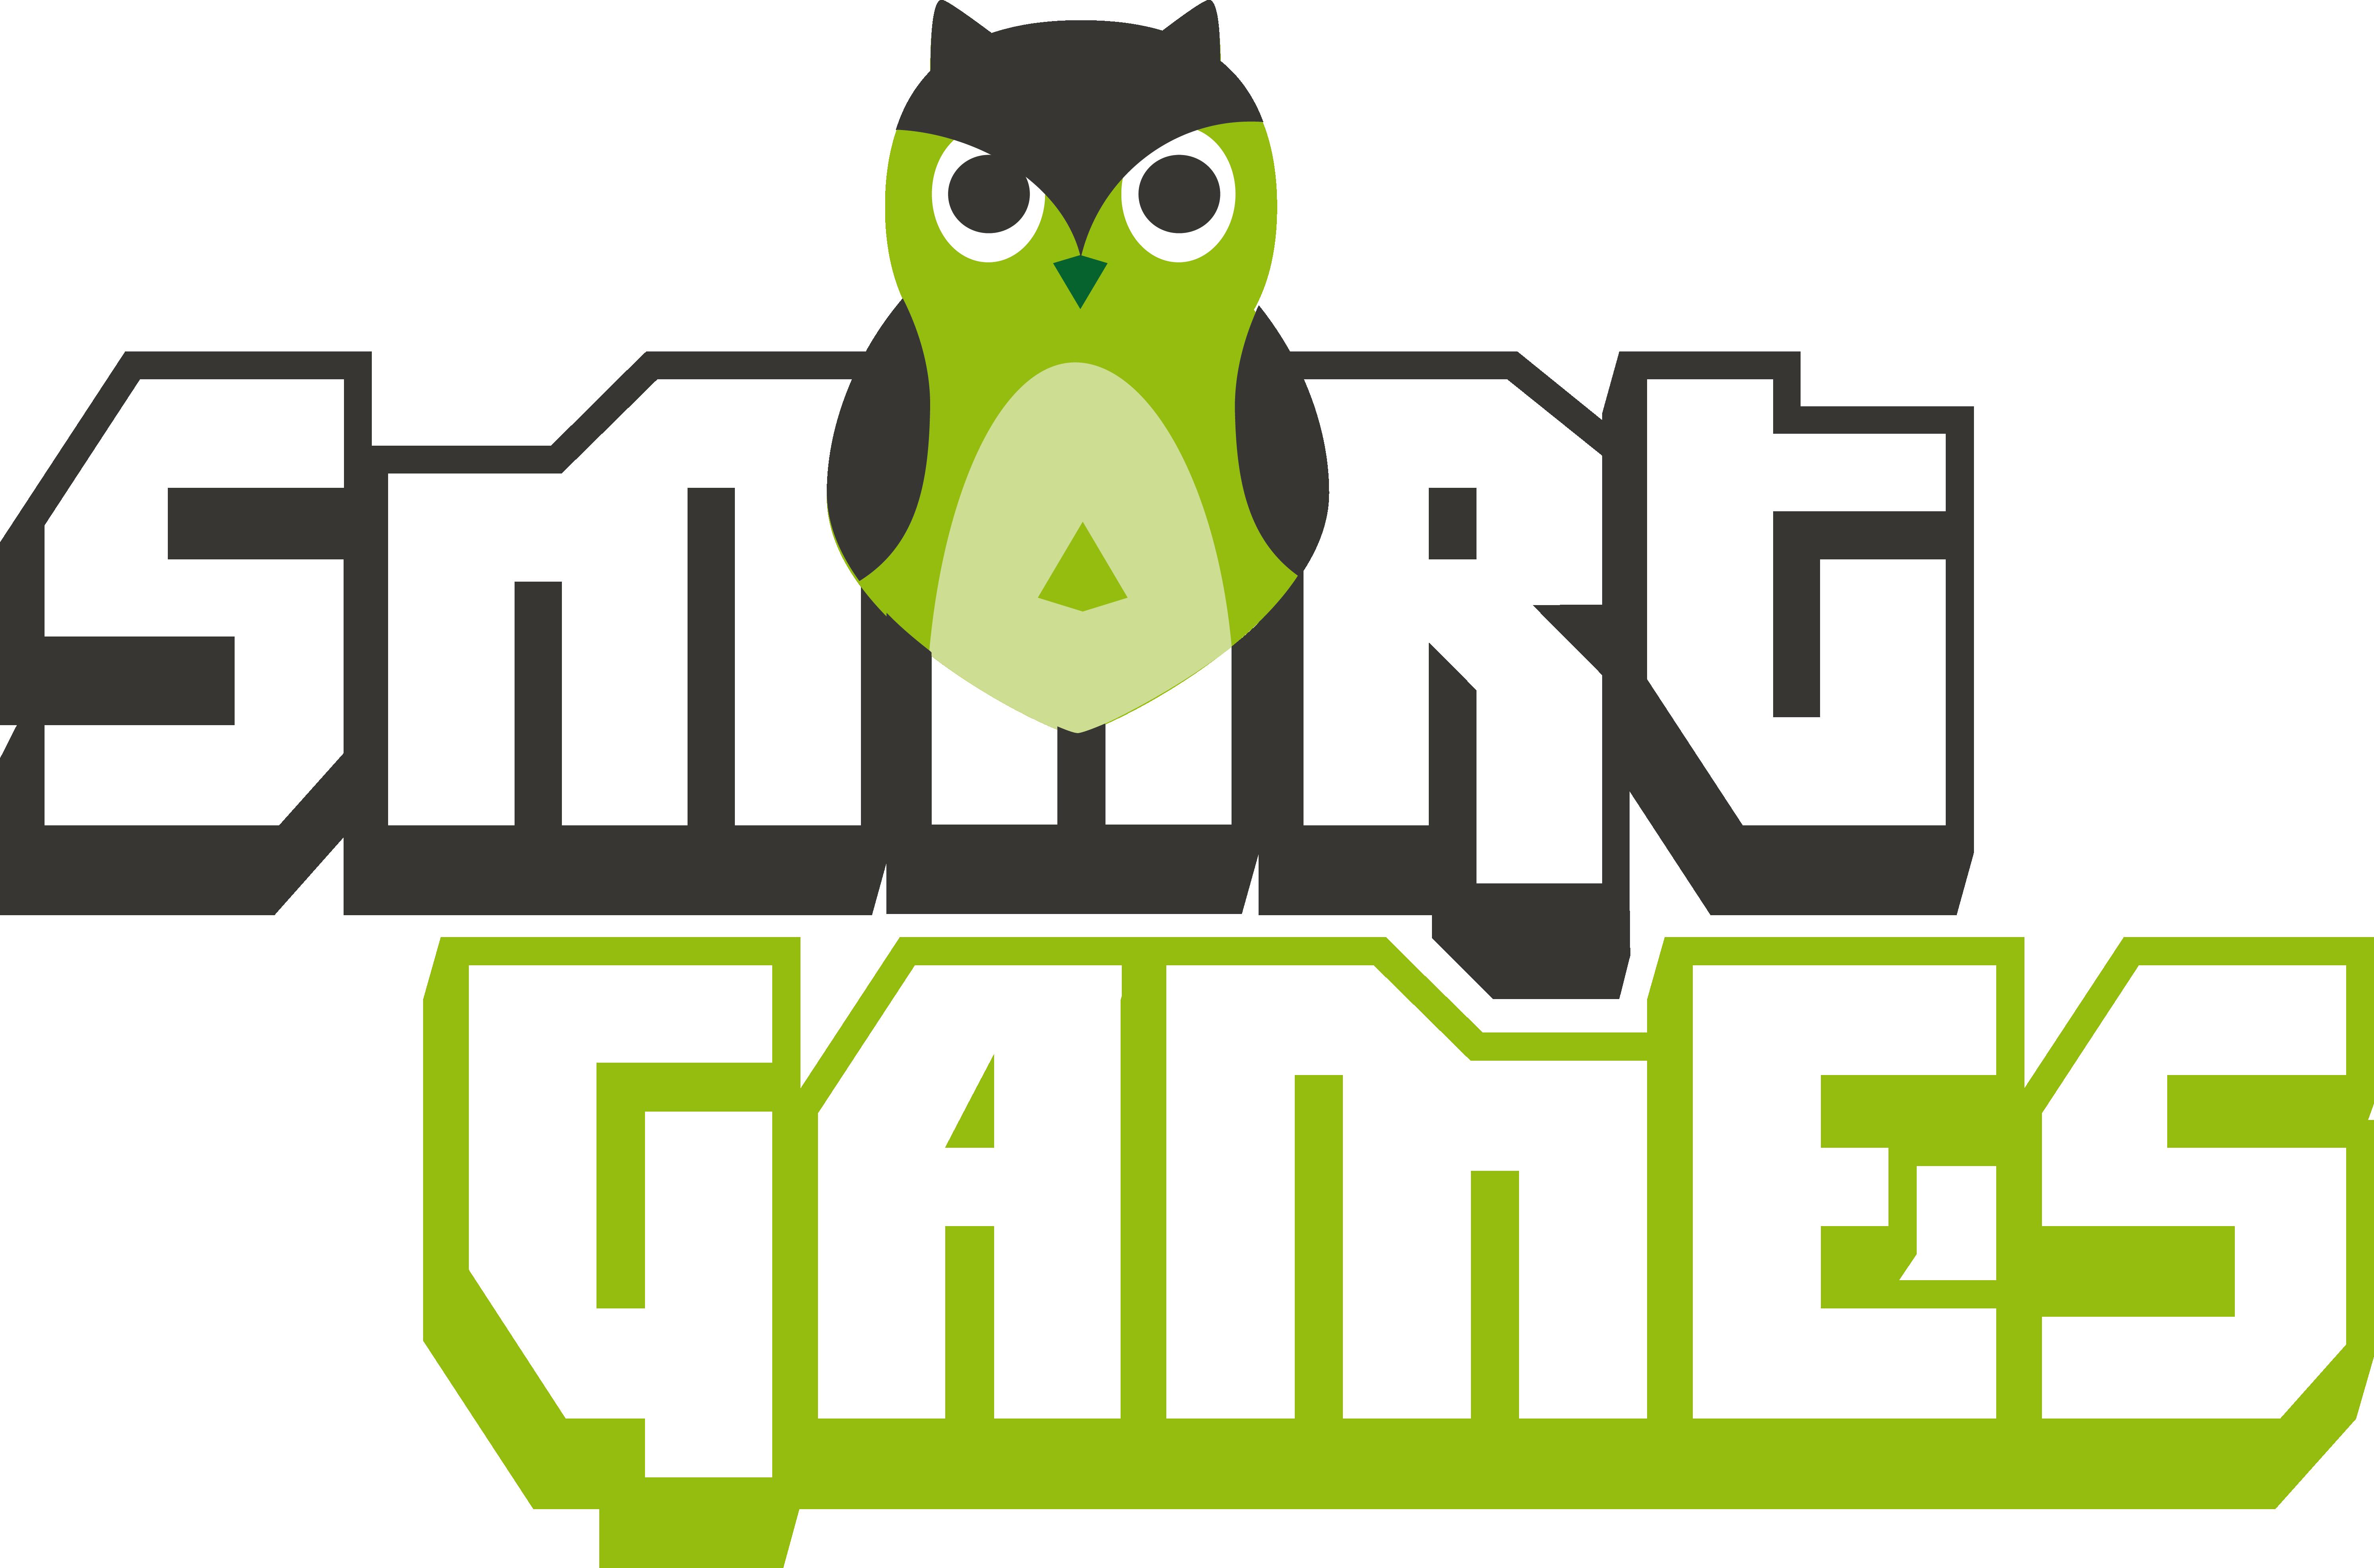 praktikum games development ws 2013 2014